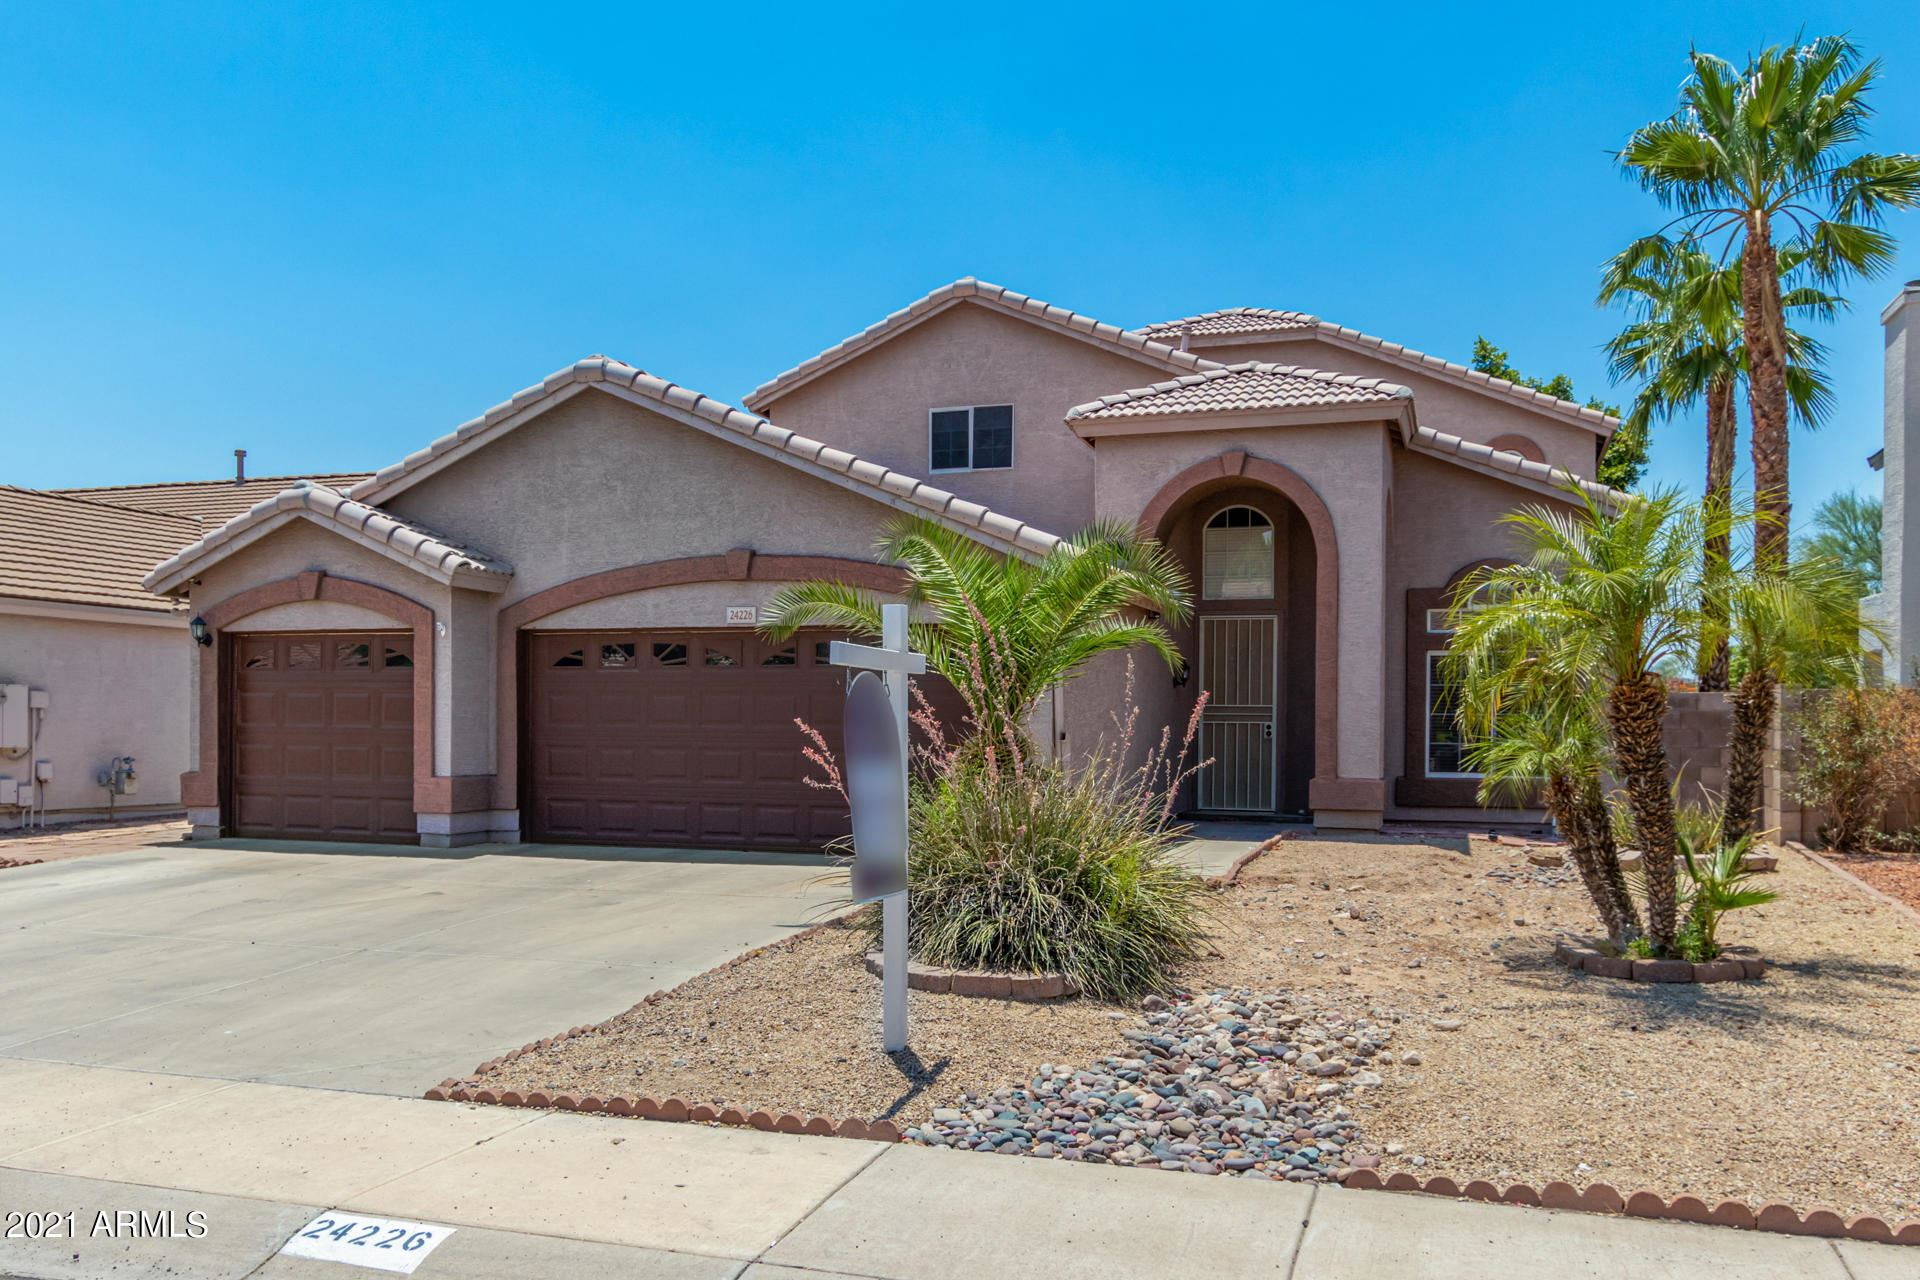 24226 N 39TH Avenue, Glendale, AZ 85310 - MLS#: 6244647